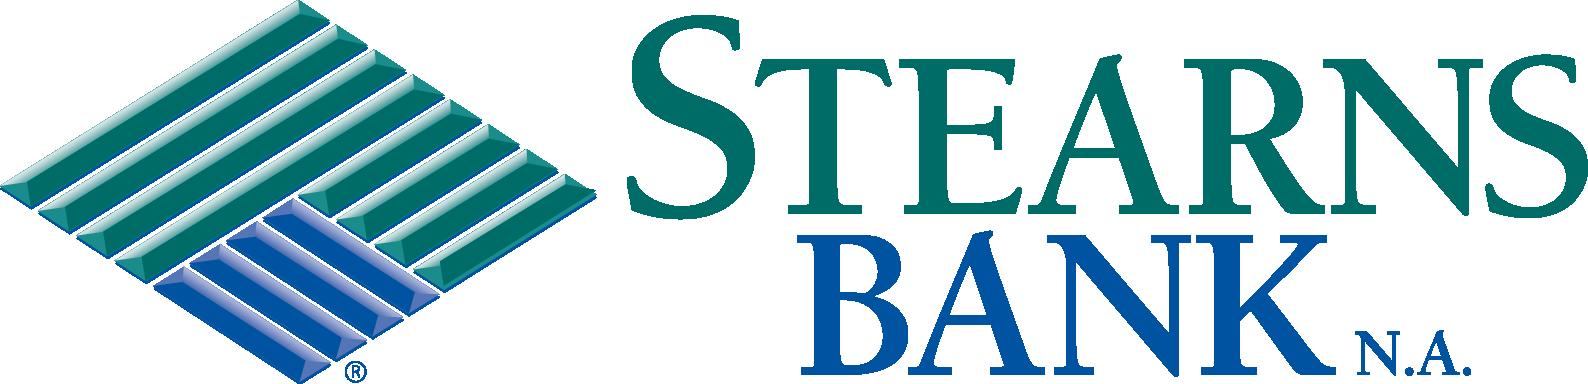 StearnsBank.png